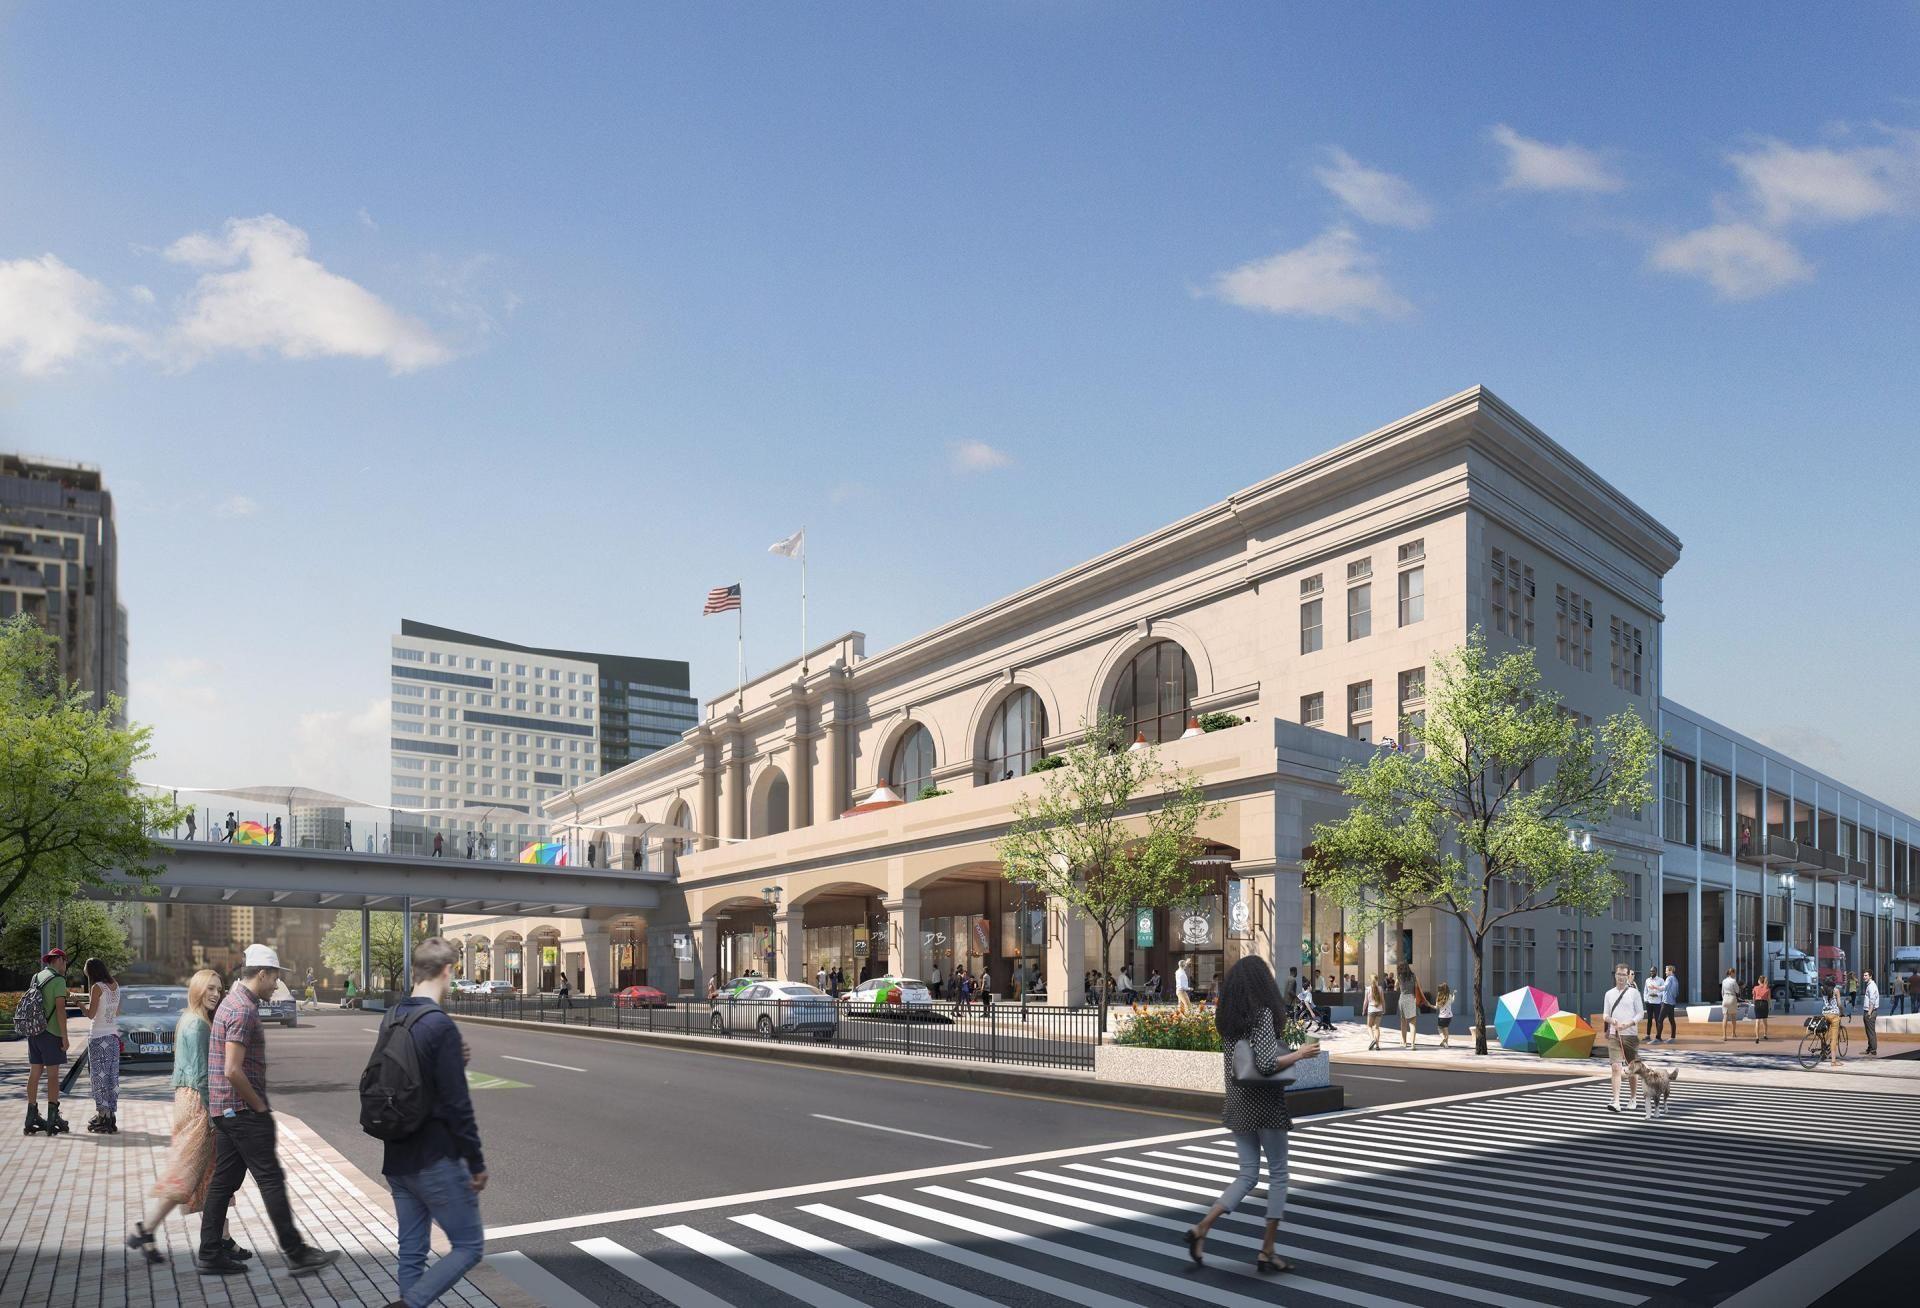 BPDA Approves Pembroke's Word Trade Center Redevelopment Plan